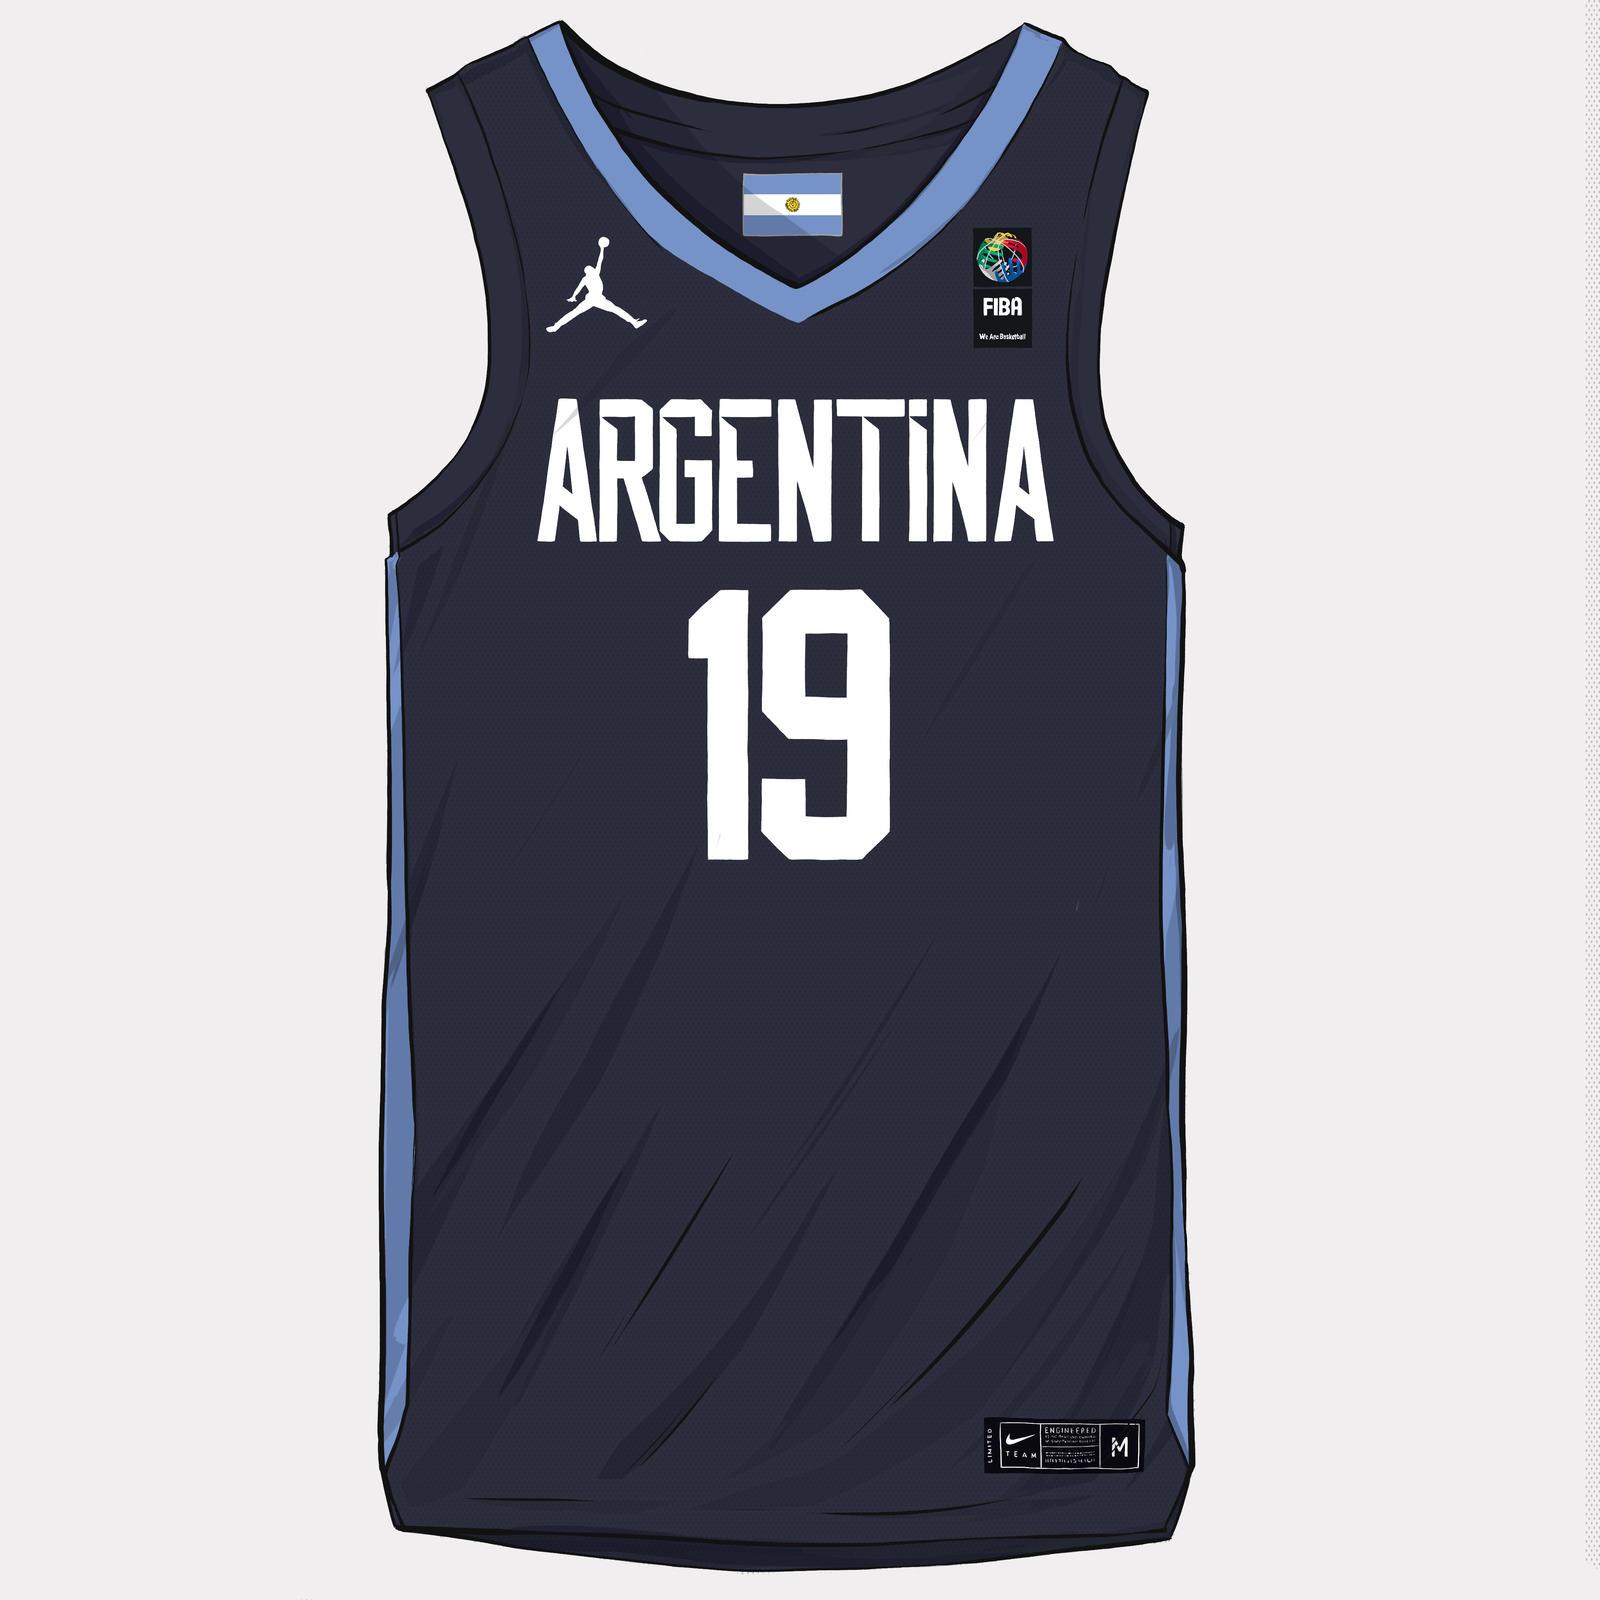 nike-news-argentina-national-team-kit-2019-illustration-1x1_1_89522.jpg